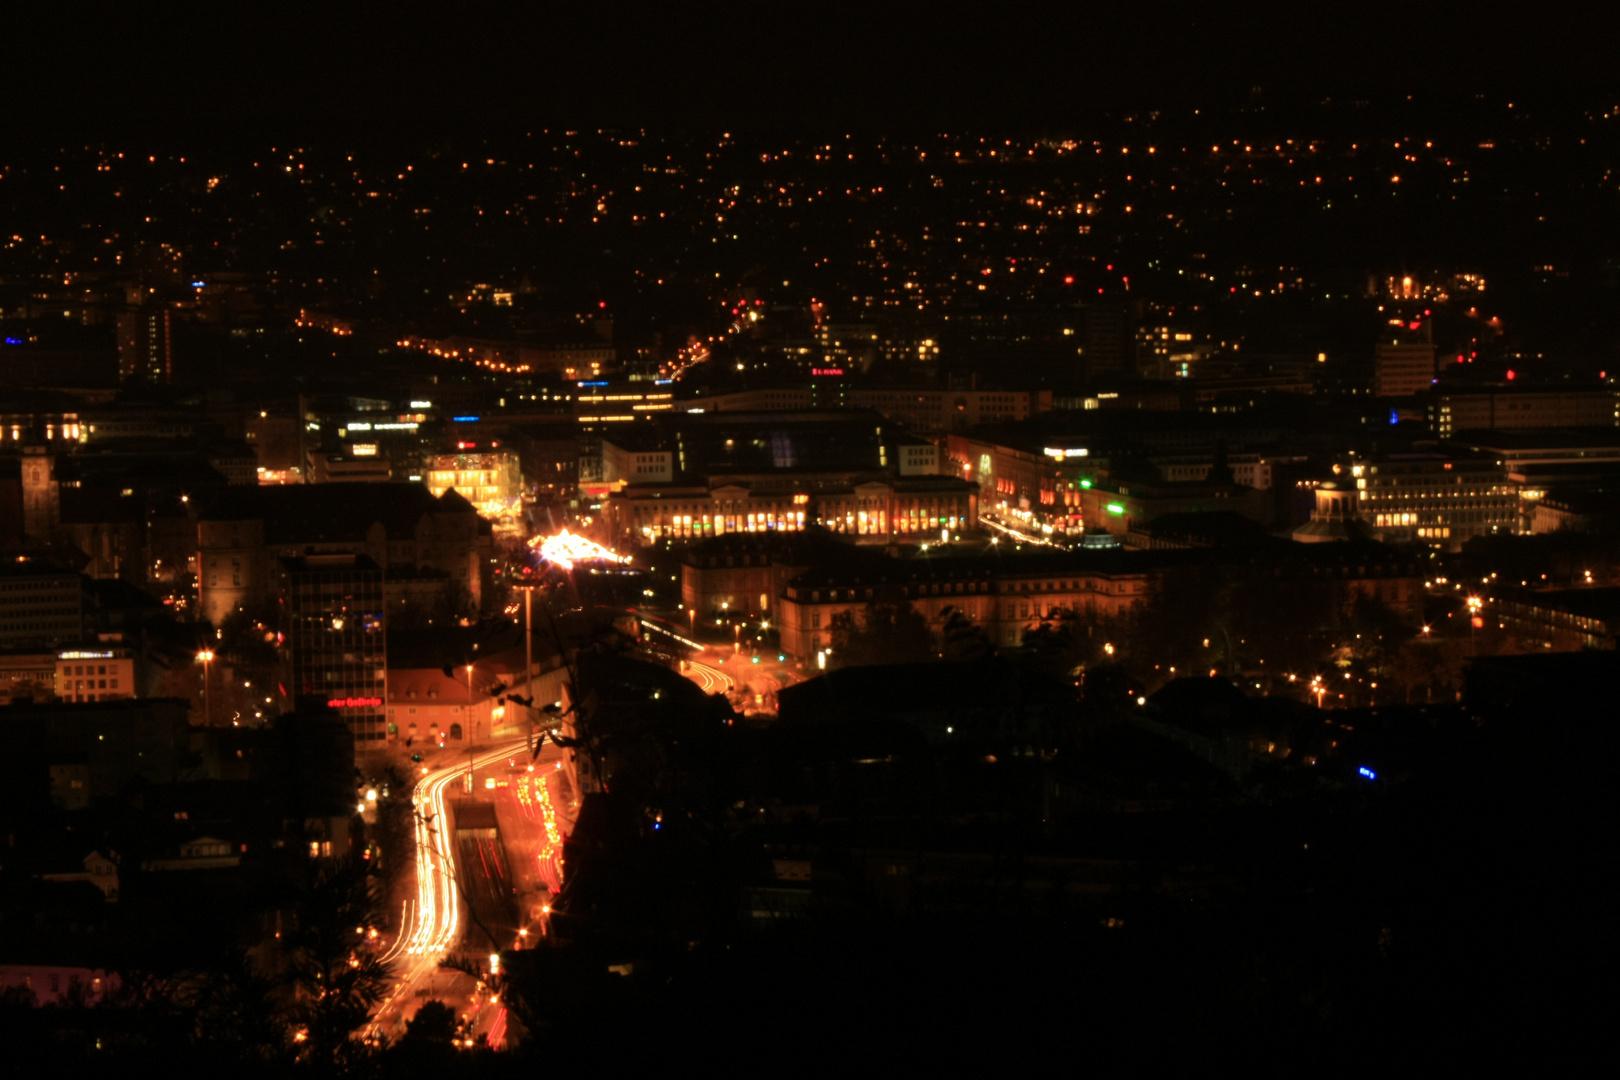 Stuttgart bei nacht3